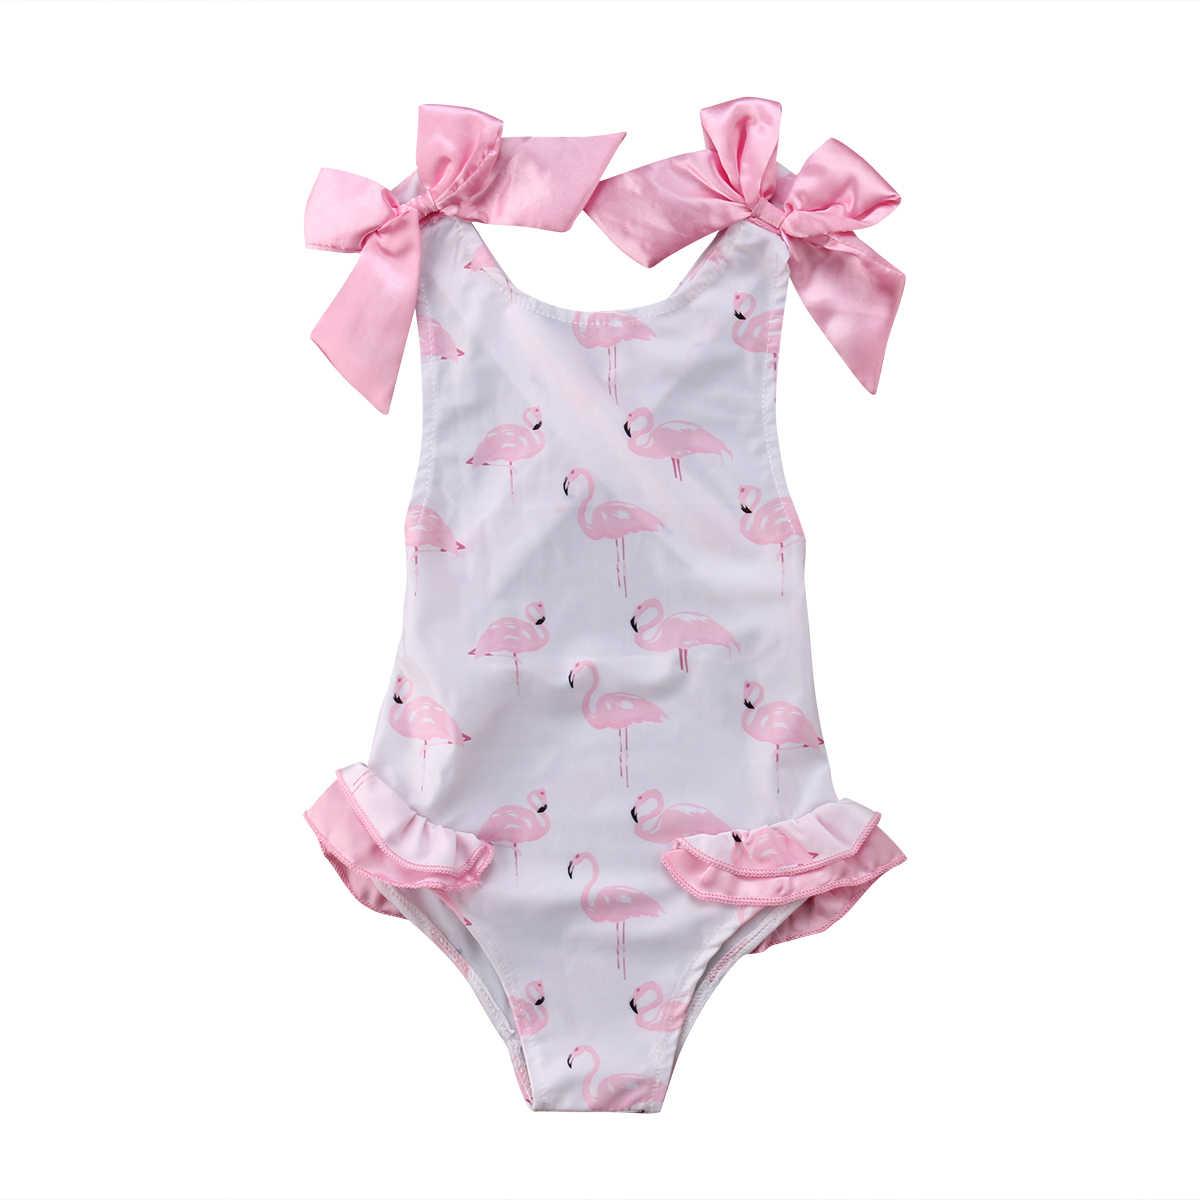 91c44b5141b32 Pudcoco 2018 New Toddler Kid Baby Girls Swimwear Flamingos Print Swimsuit  One-piece Bathing Suit